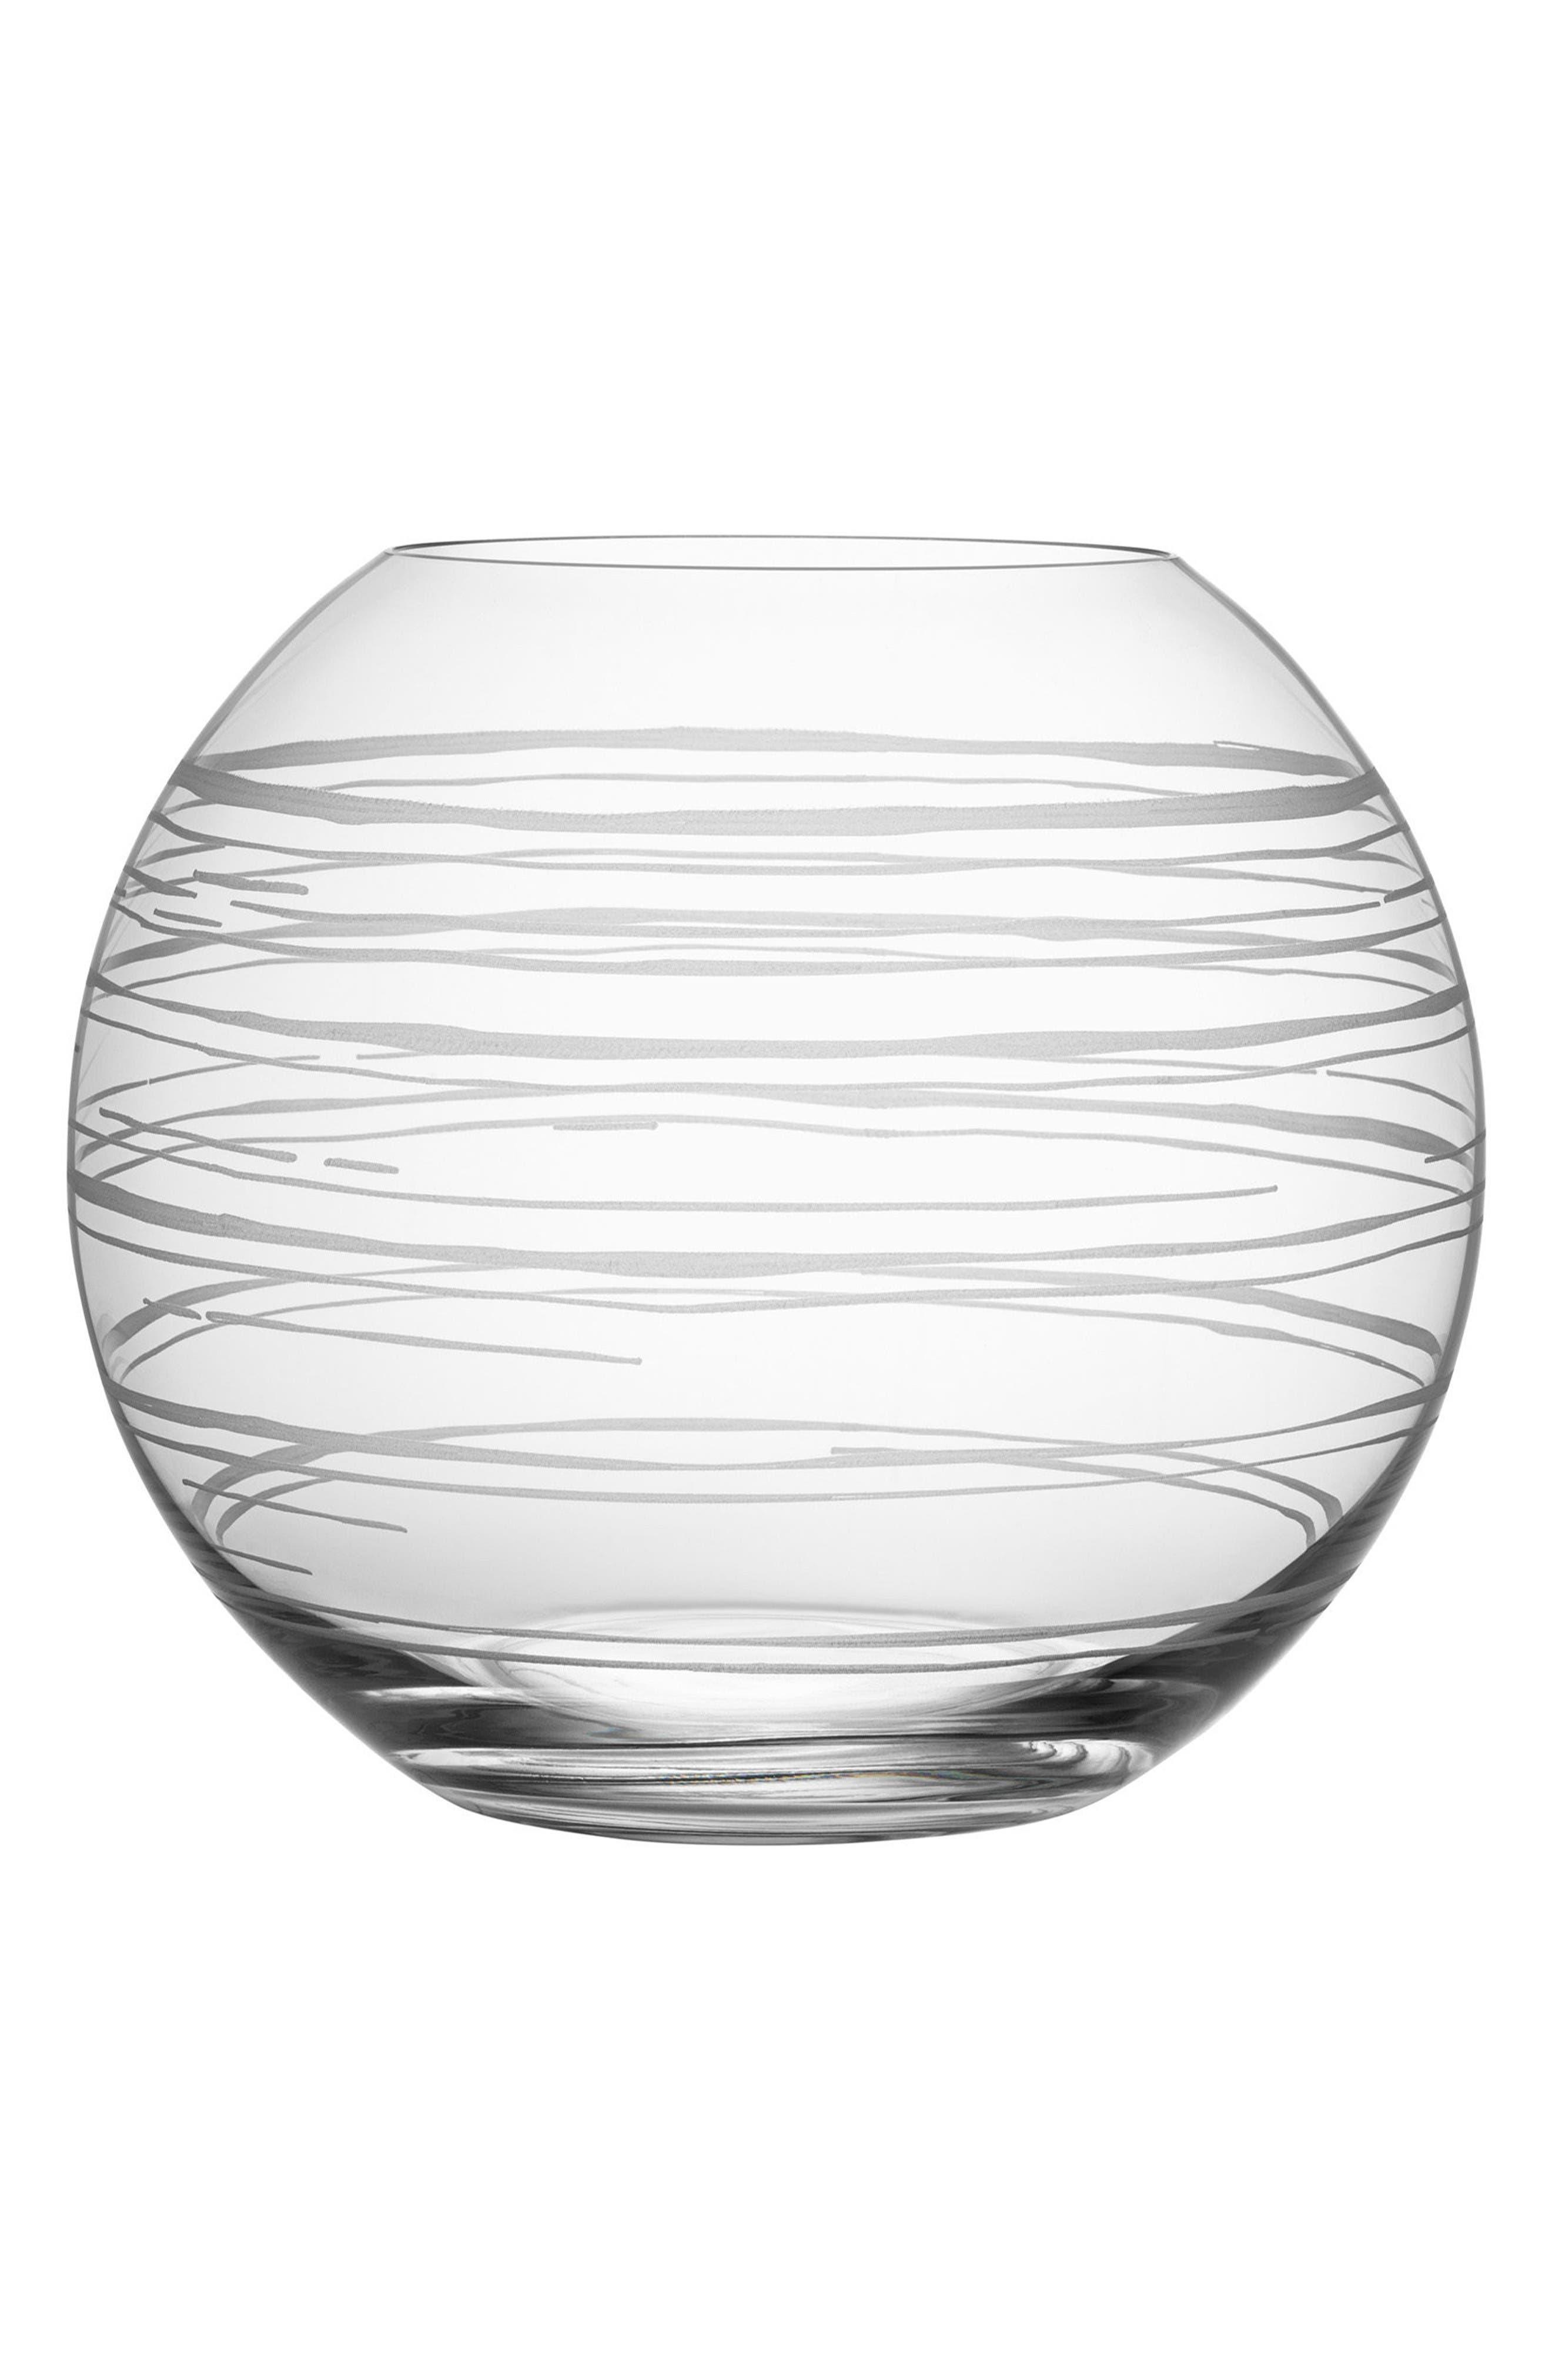 Main Image - Orrefors Graphic Round Vase